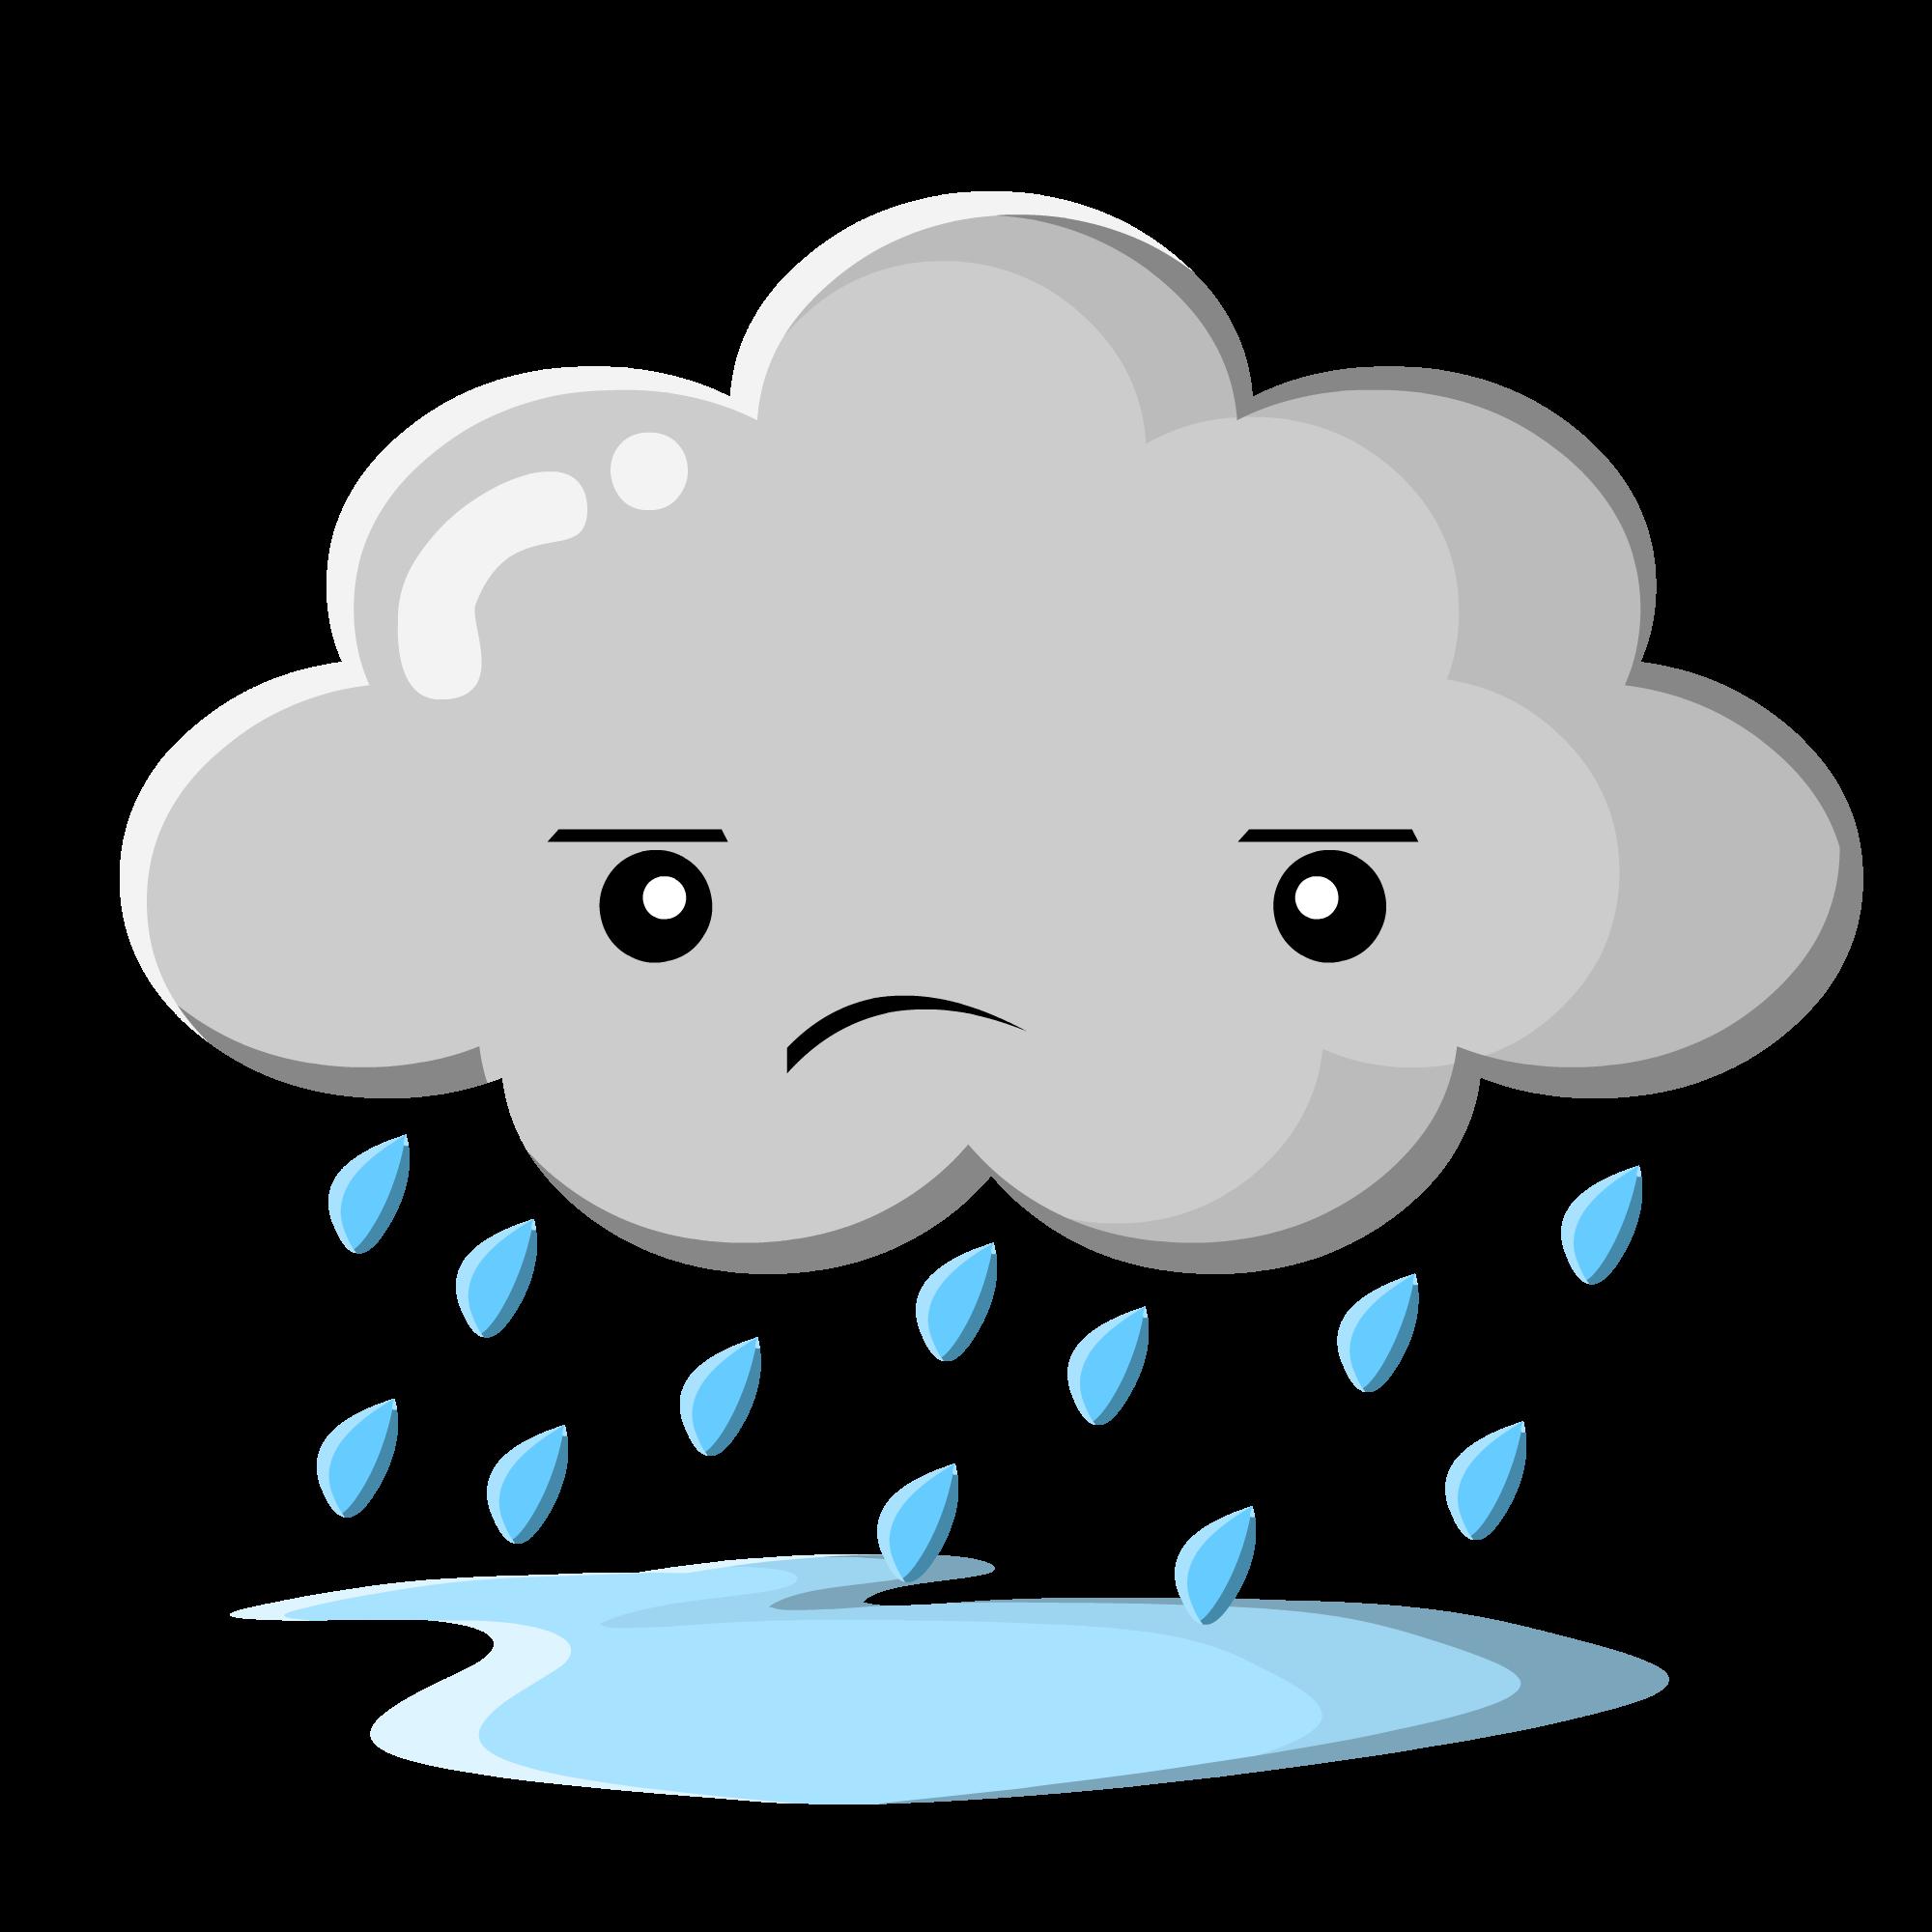 banner freeuse stock Rainy cilpart pretentious design. Raining clipart face